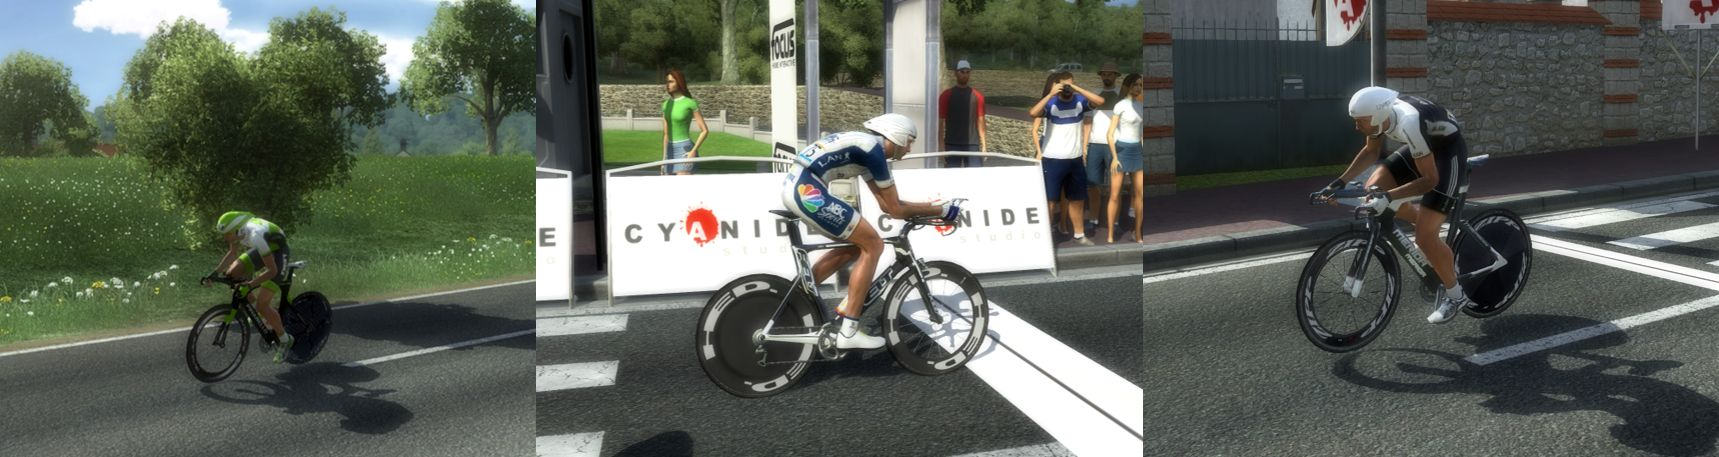 pcmdaily.com/images/mg/2019/Races/C1/Bayern/S4/mg19_bay_s04_18.jpg